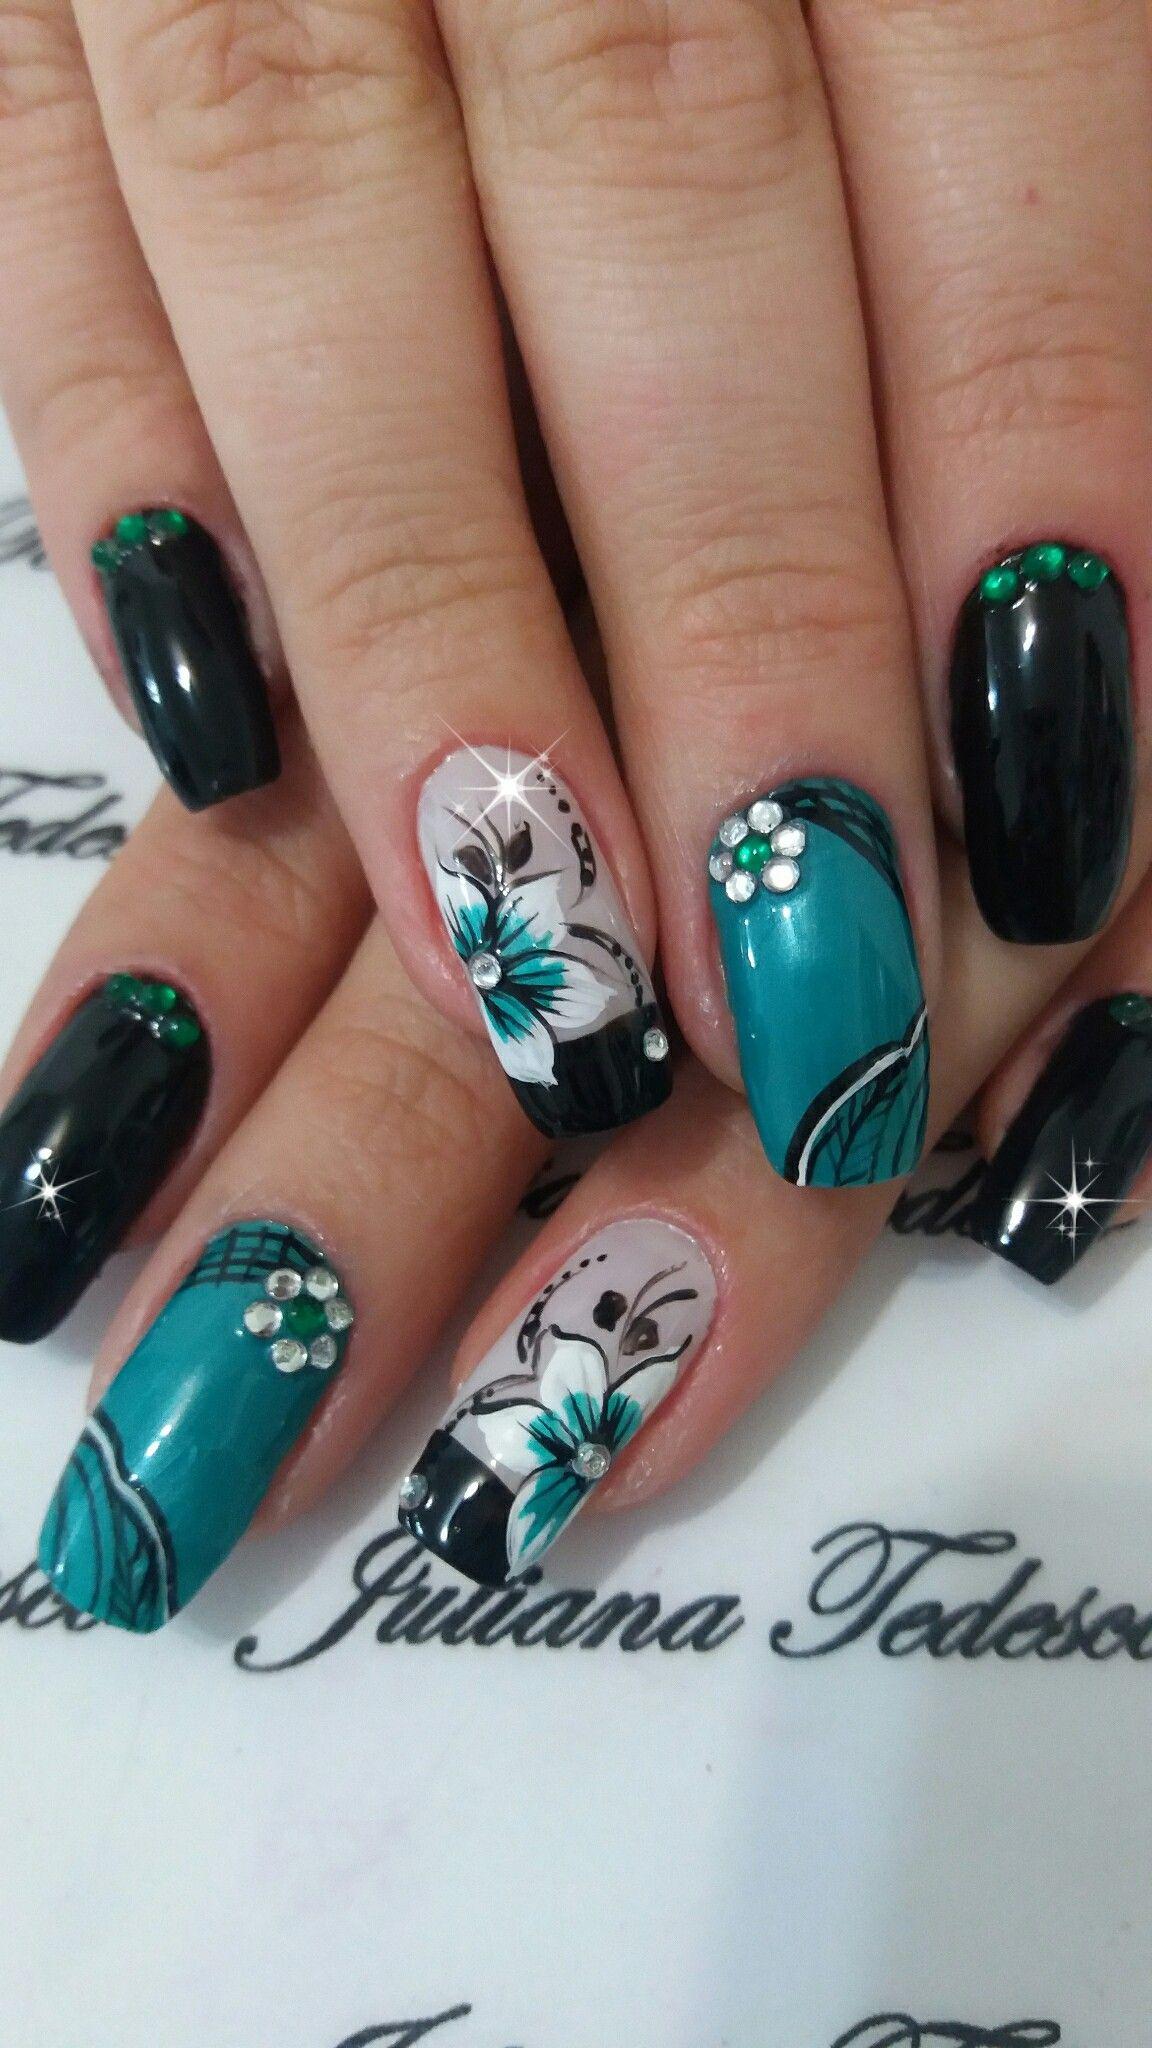 teal white & black nails nail